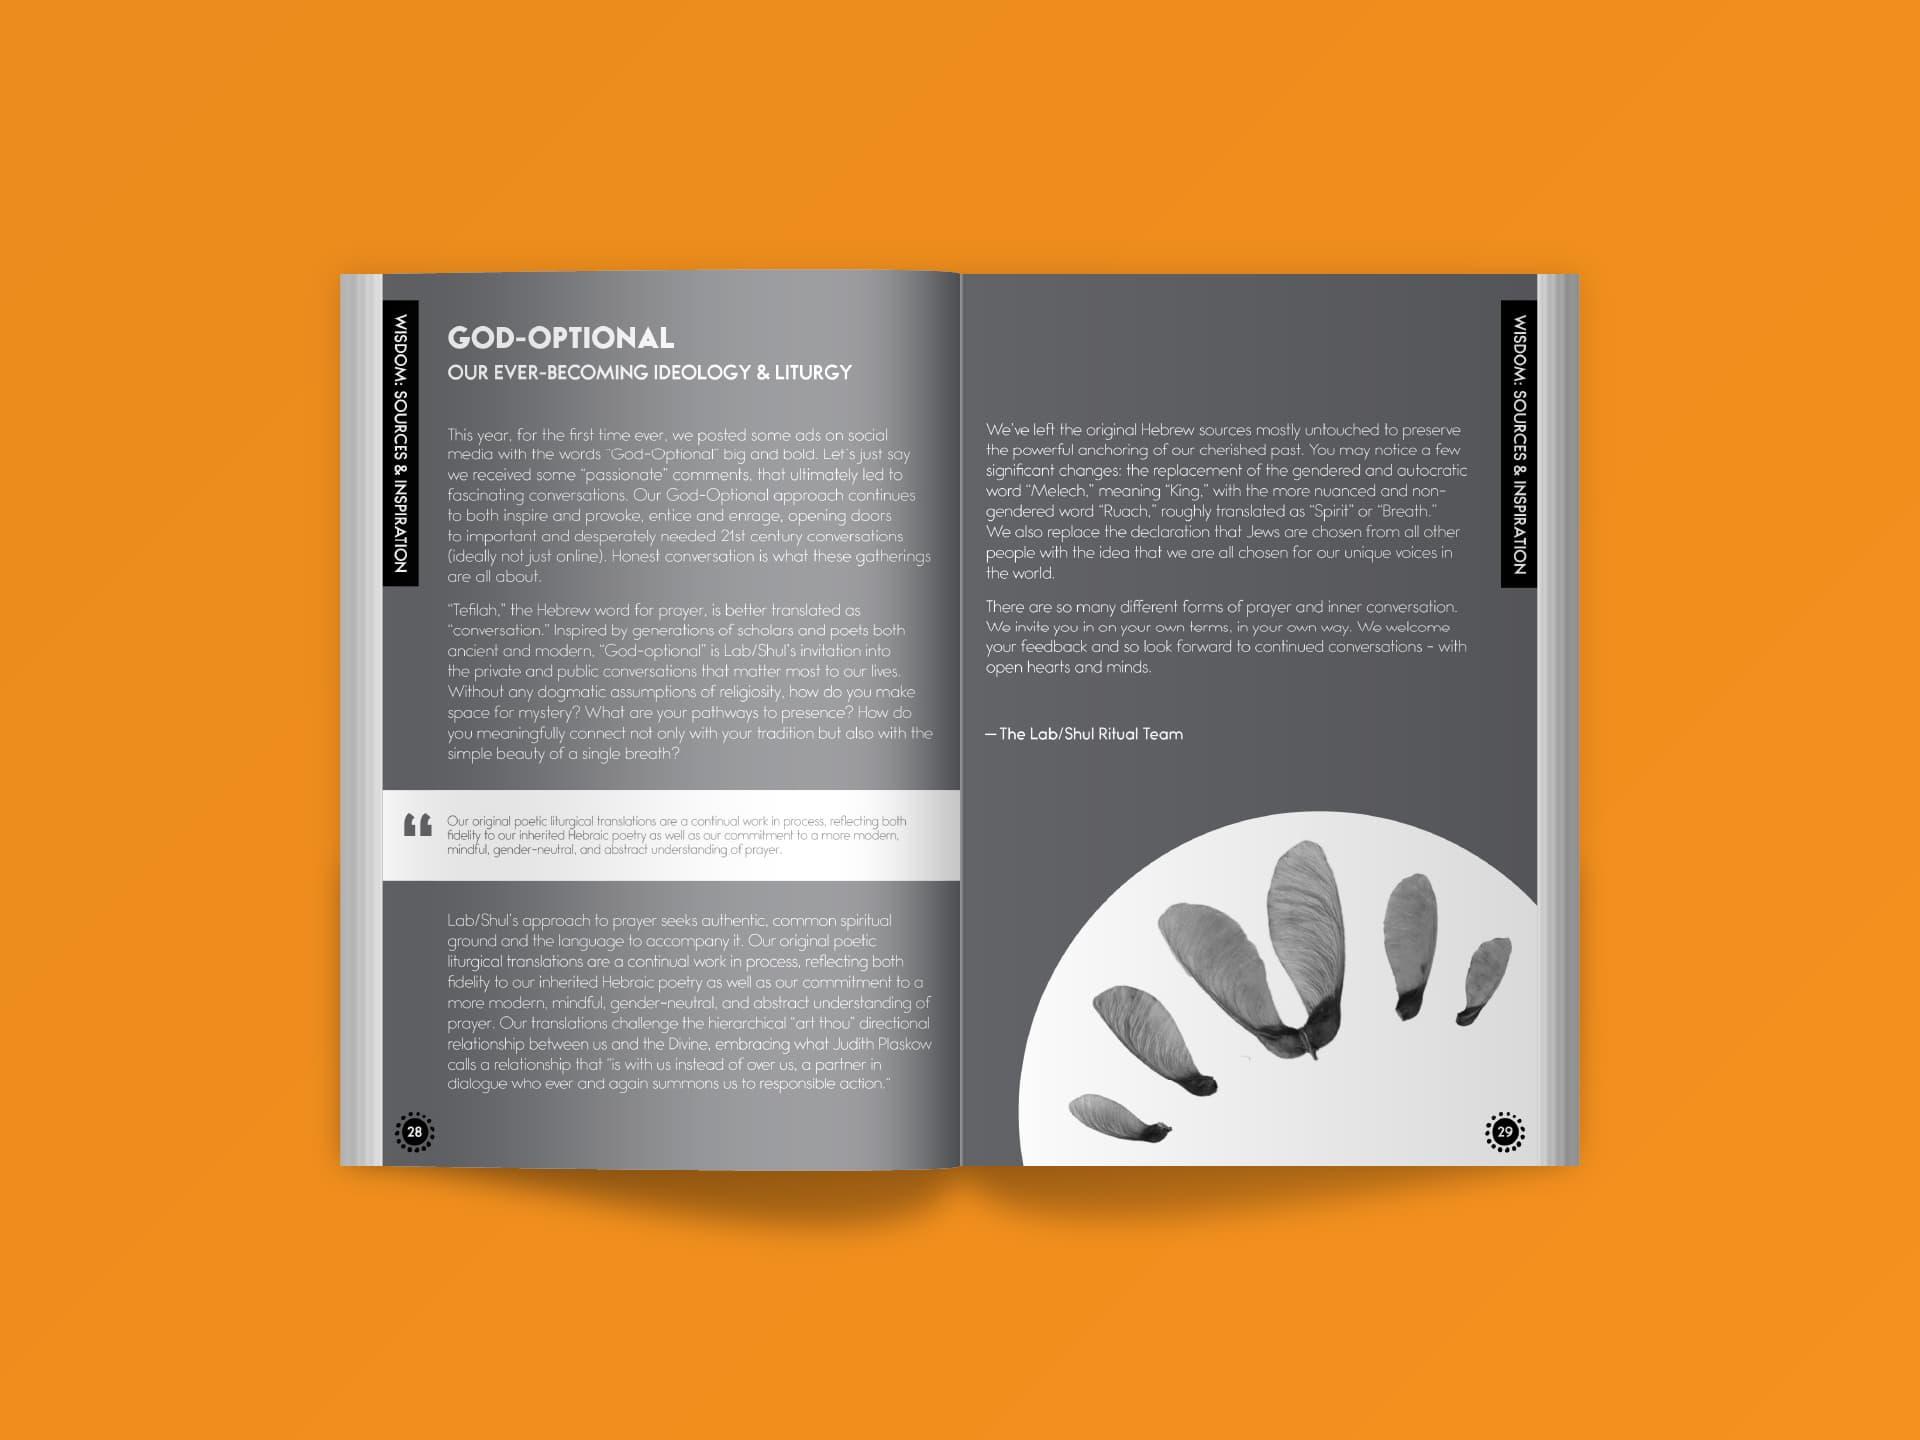 Program (Pages 28-29)